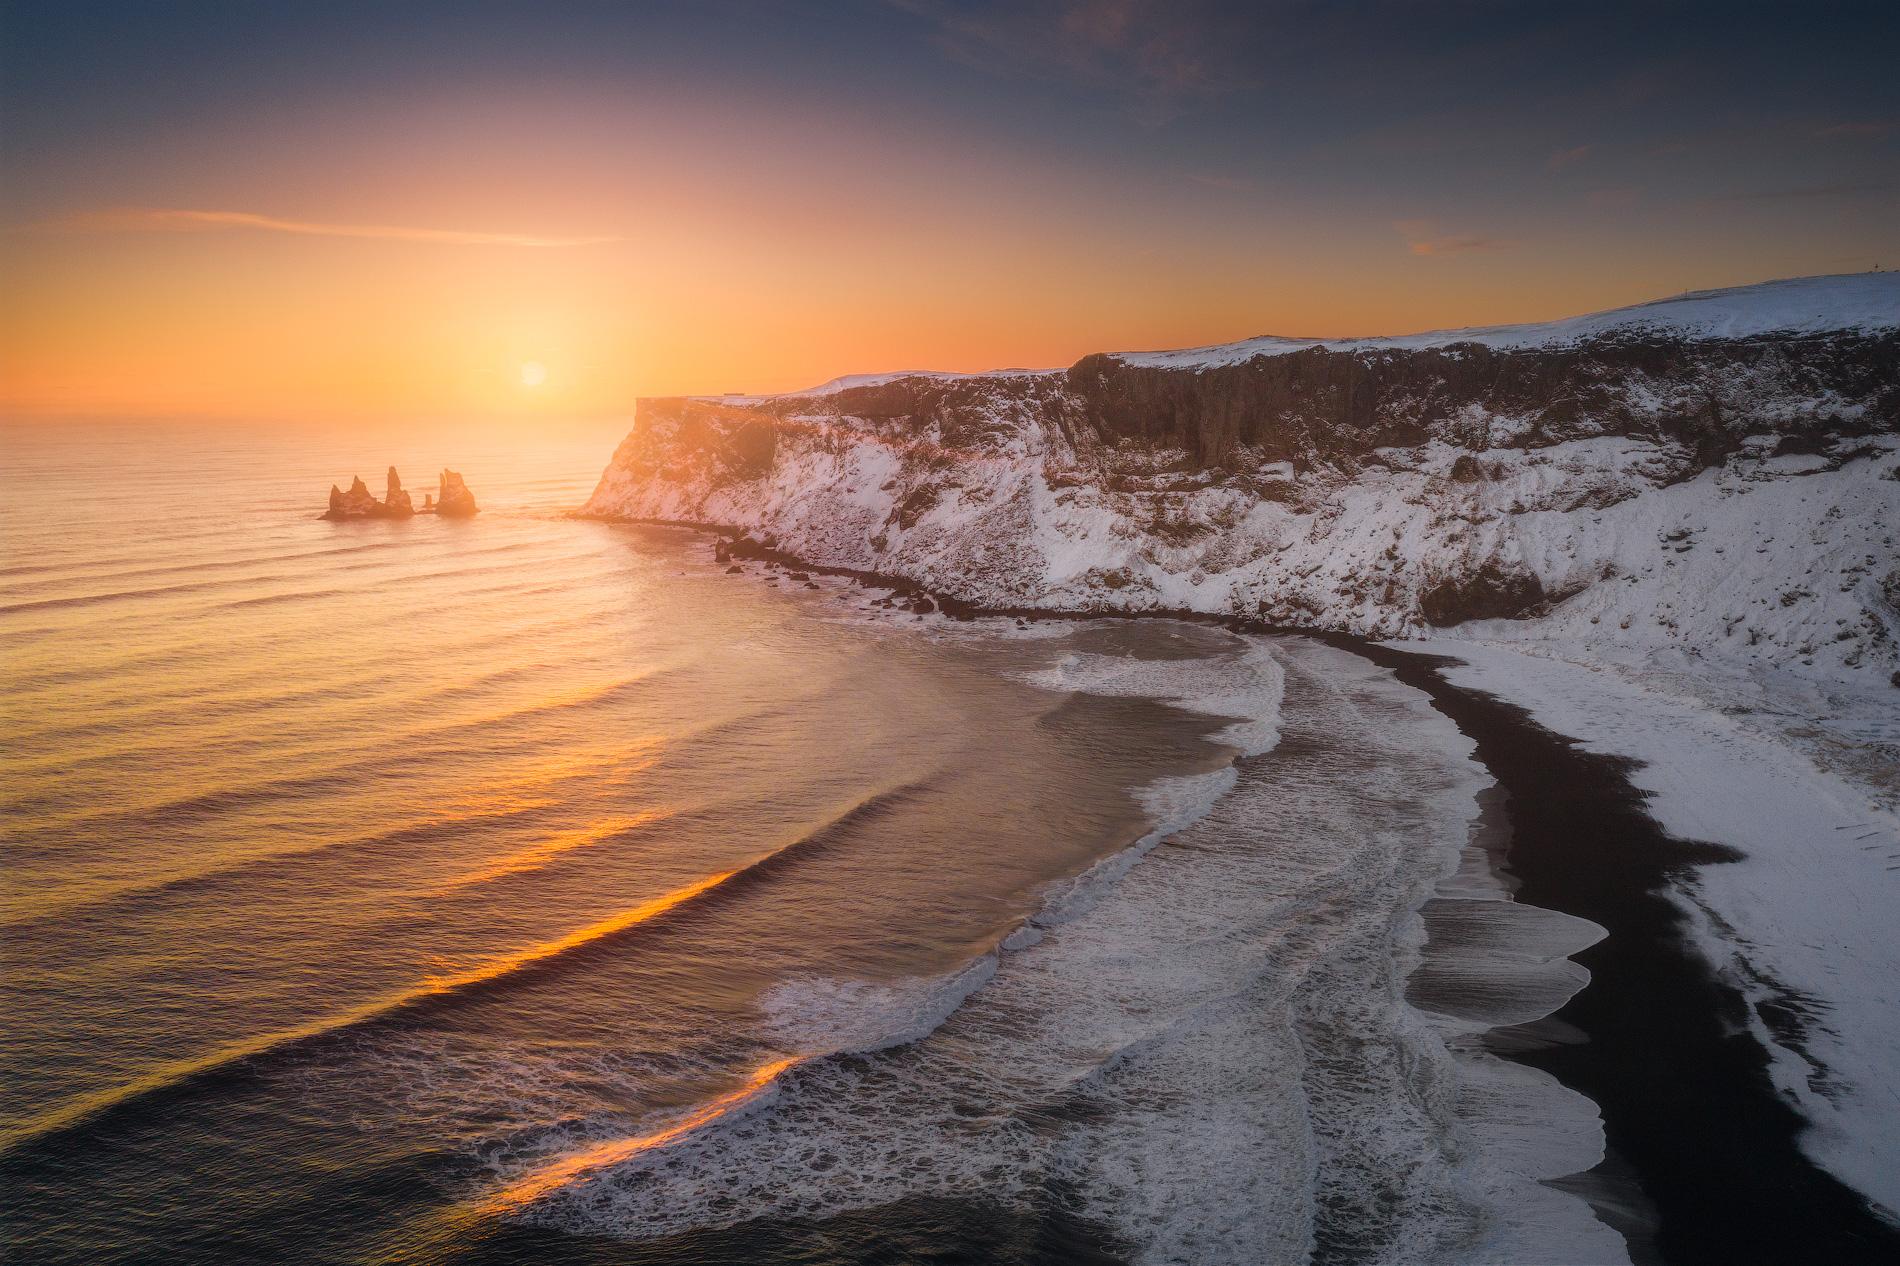 Sonnenuntergang an Islands atemberaubender Südküste.